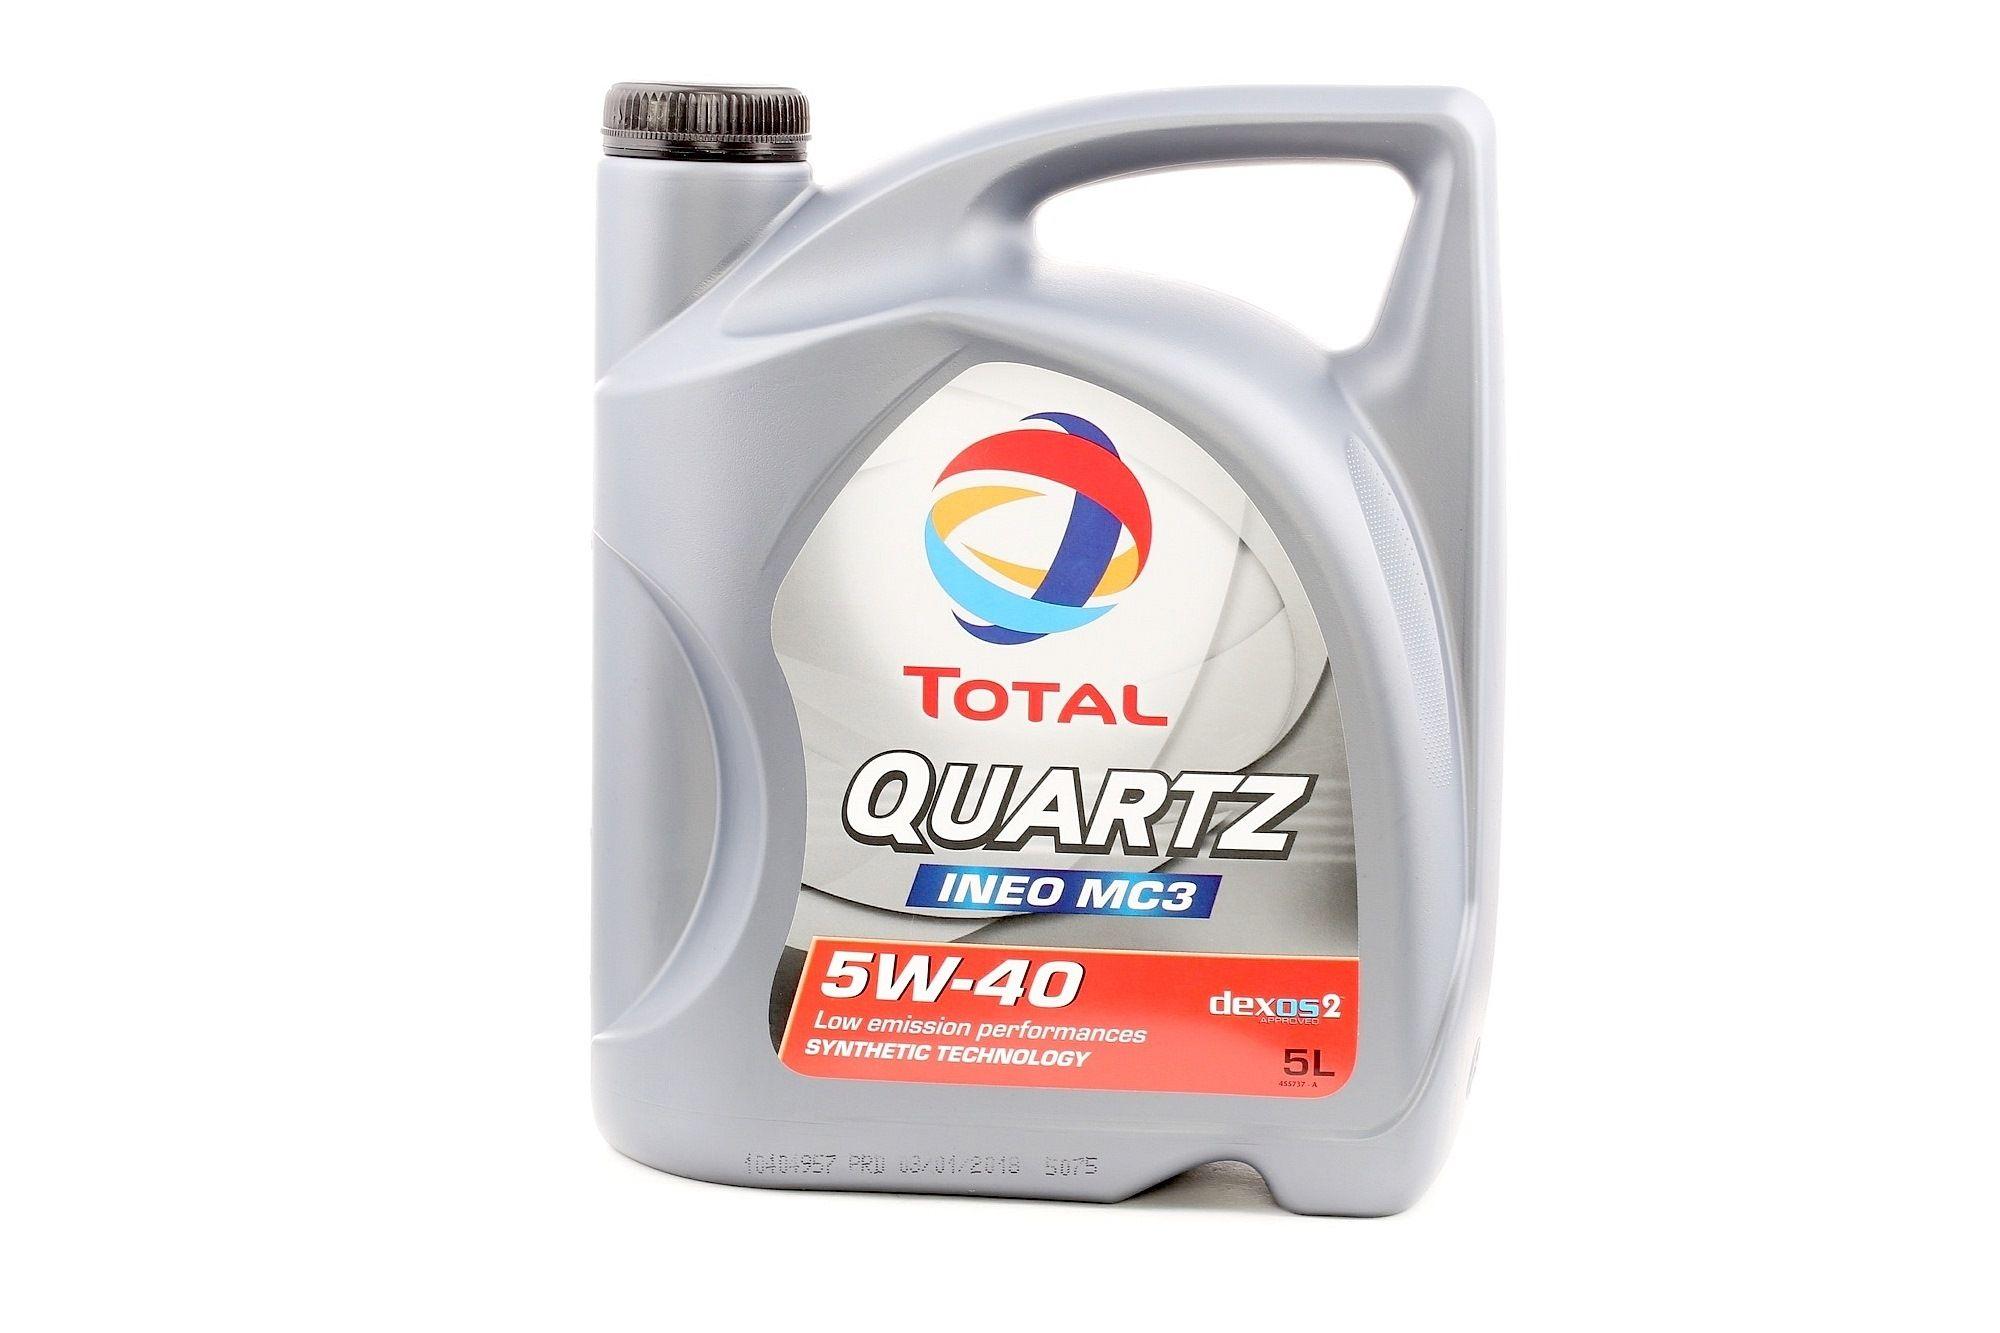 P000322 TOTAL Quartz, INEO MC3 5W-40, 5l, Óleo sintético Óleo do motor 2174777 comprar económica